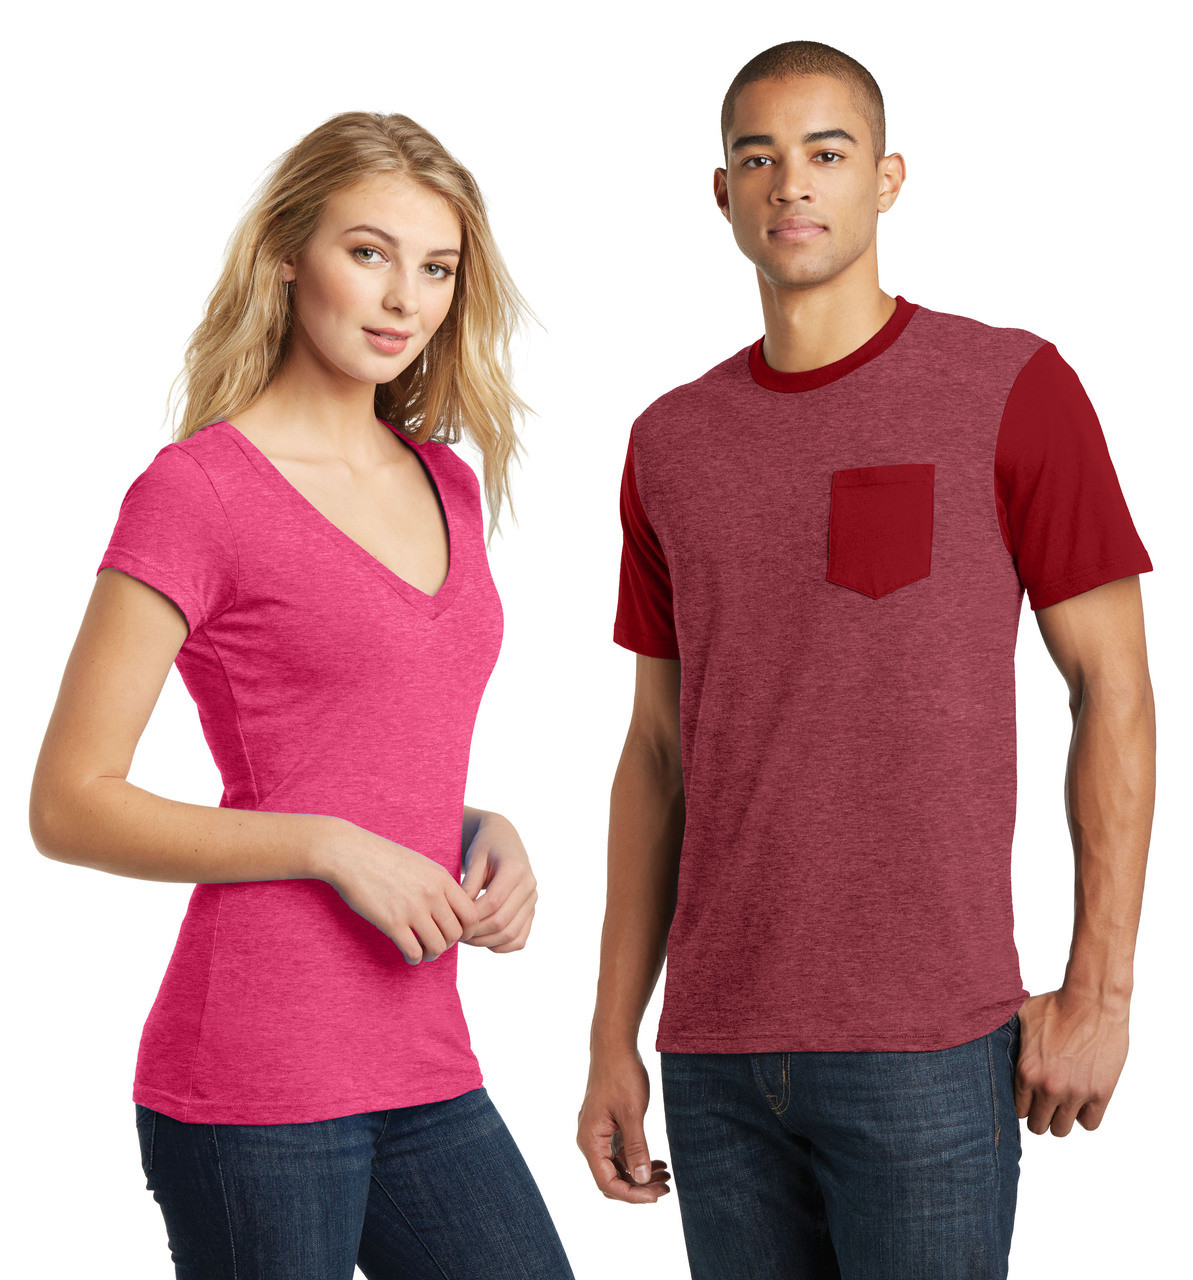 WaitStaff Tee Shirt by District Threads